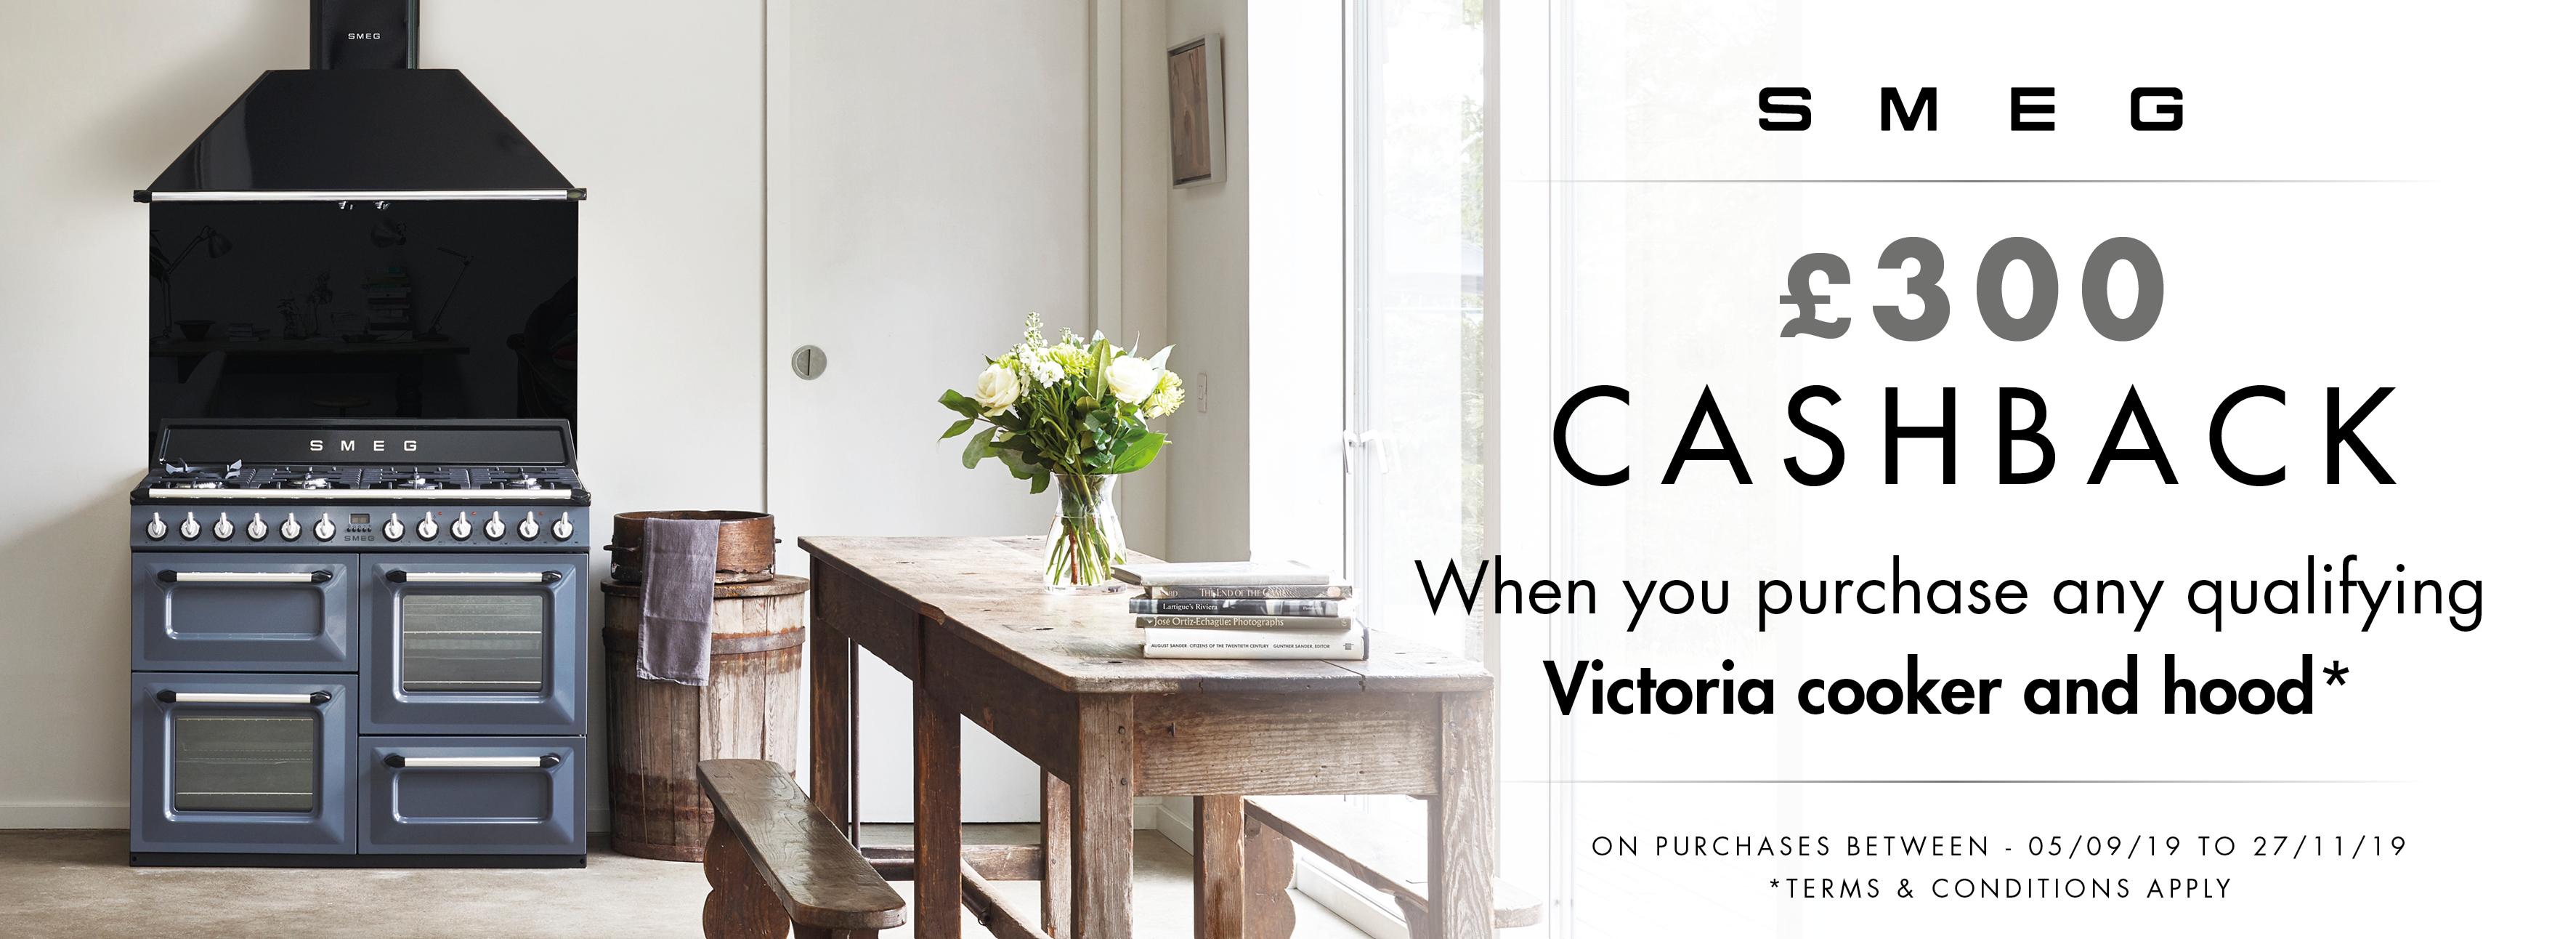 Smeg Victoria £300 Cashback